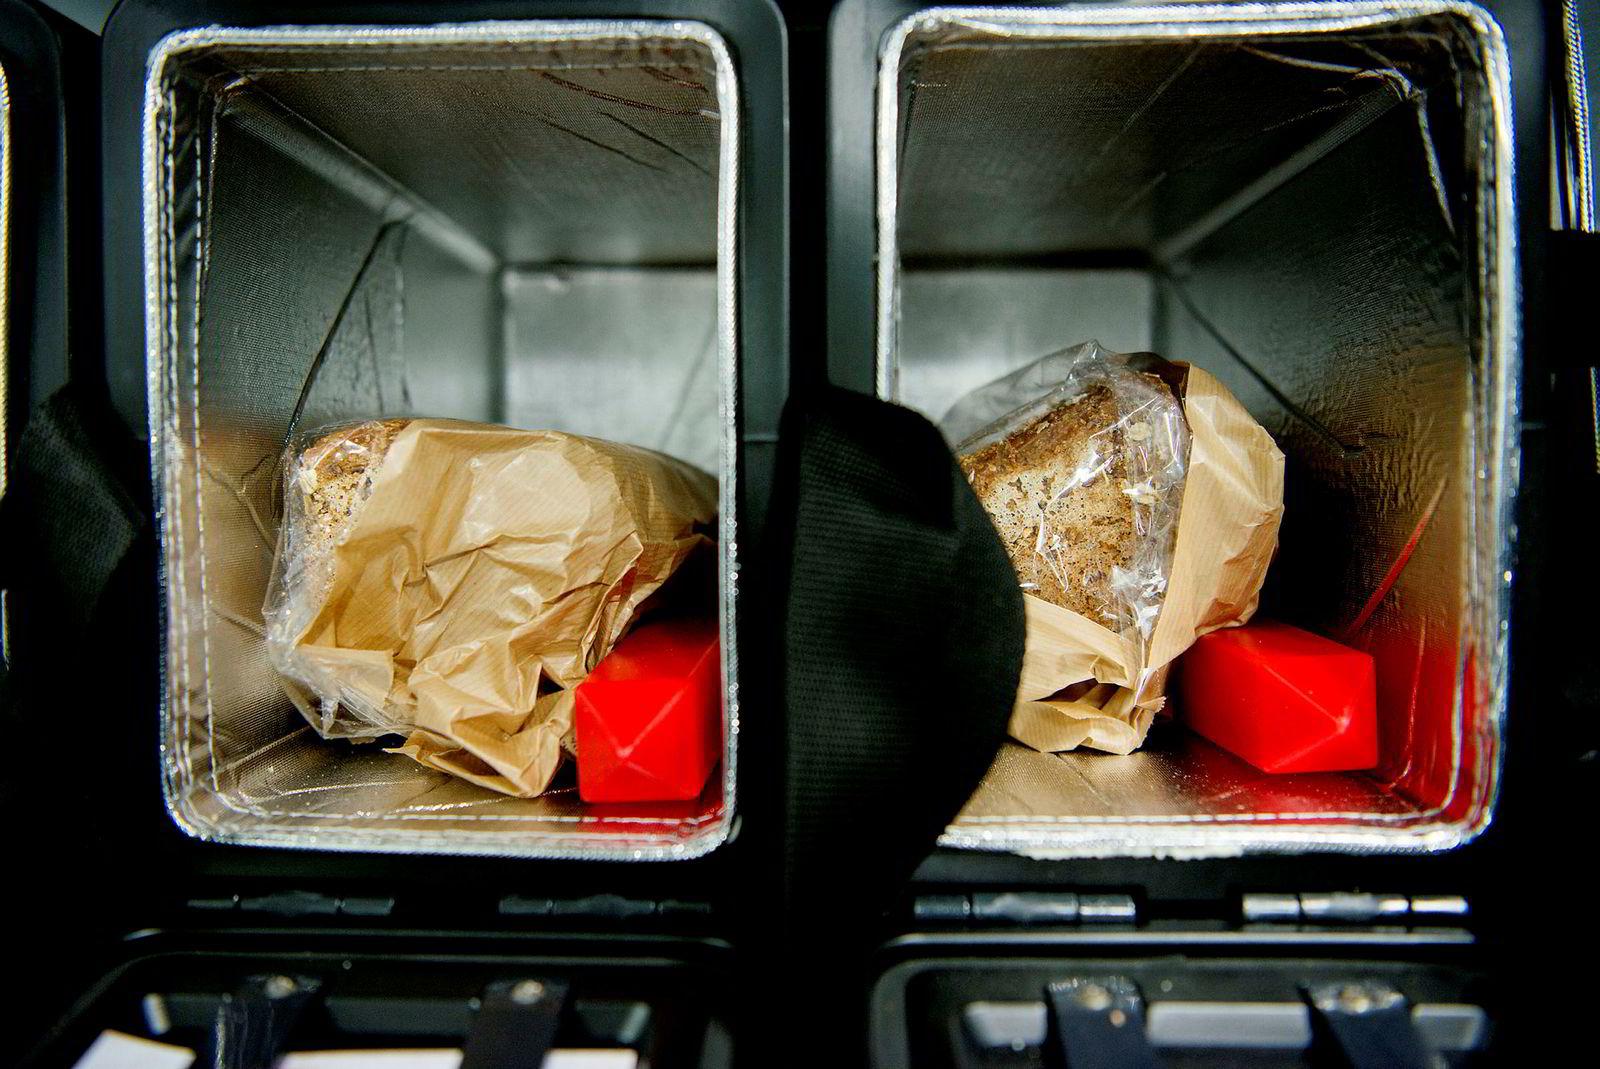 Brødboksen leverer brød, melk og andre matvarer på kundens dør hver morgen.